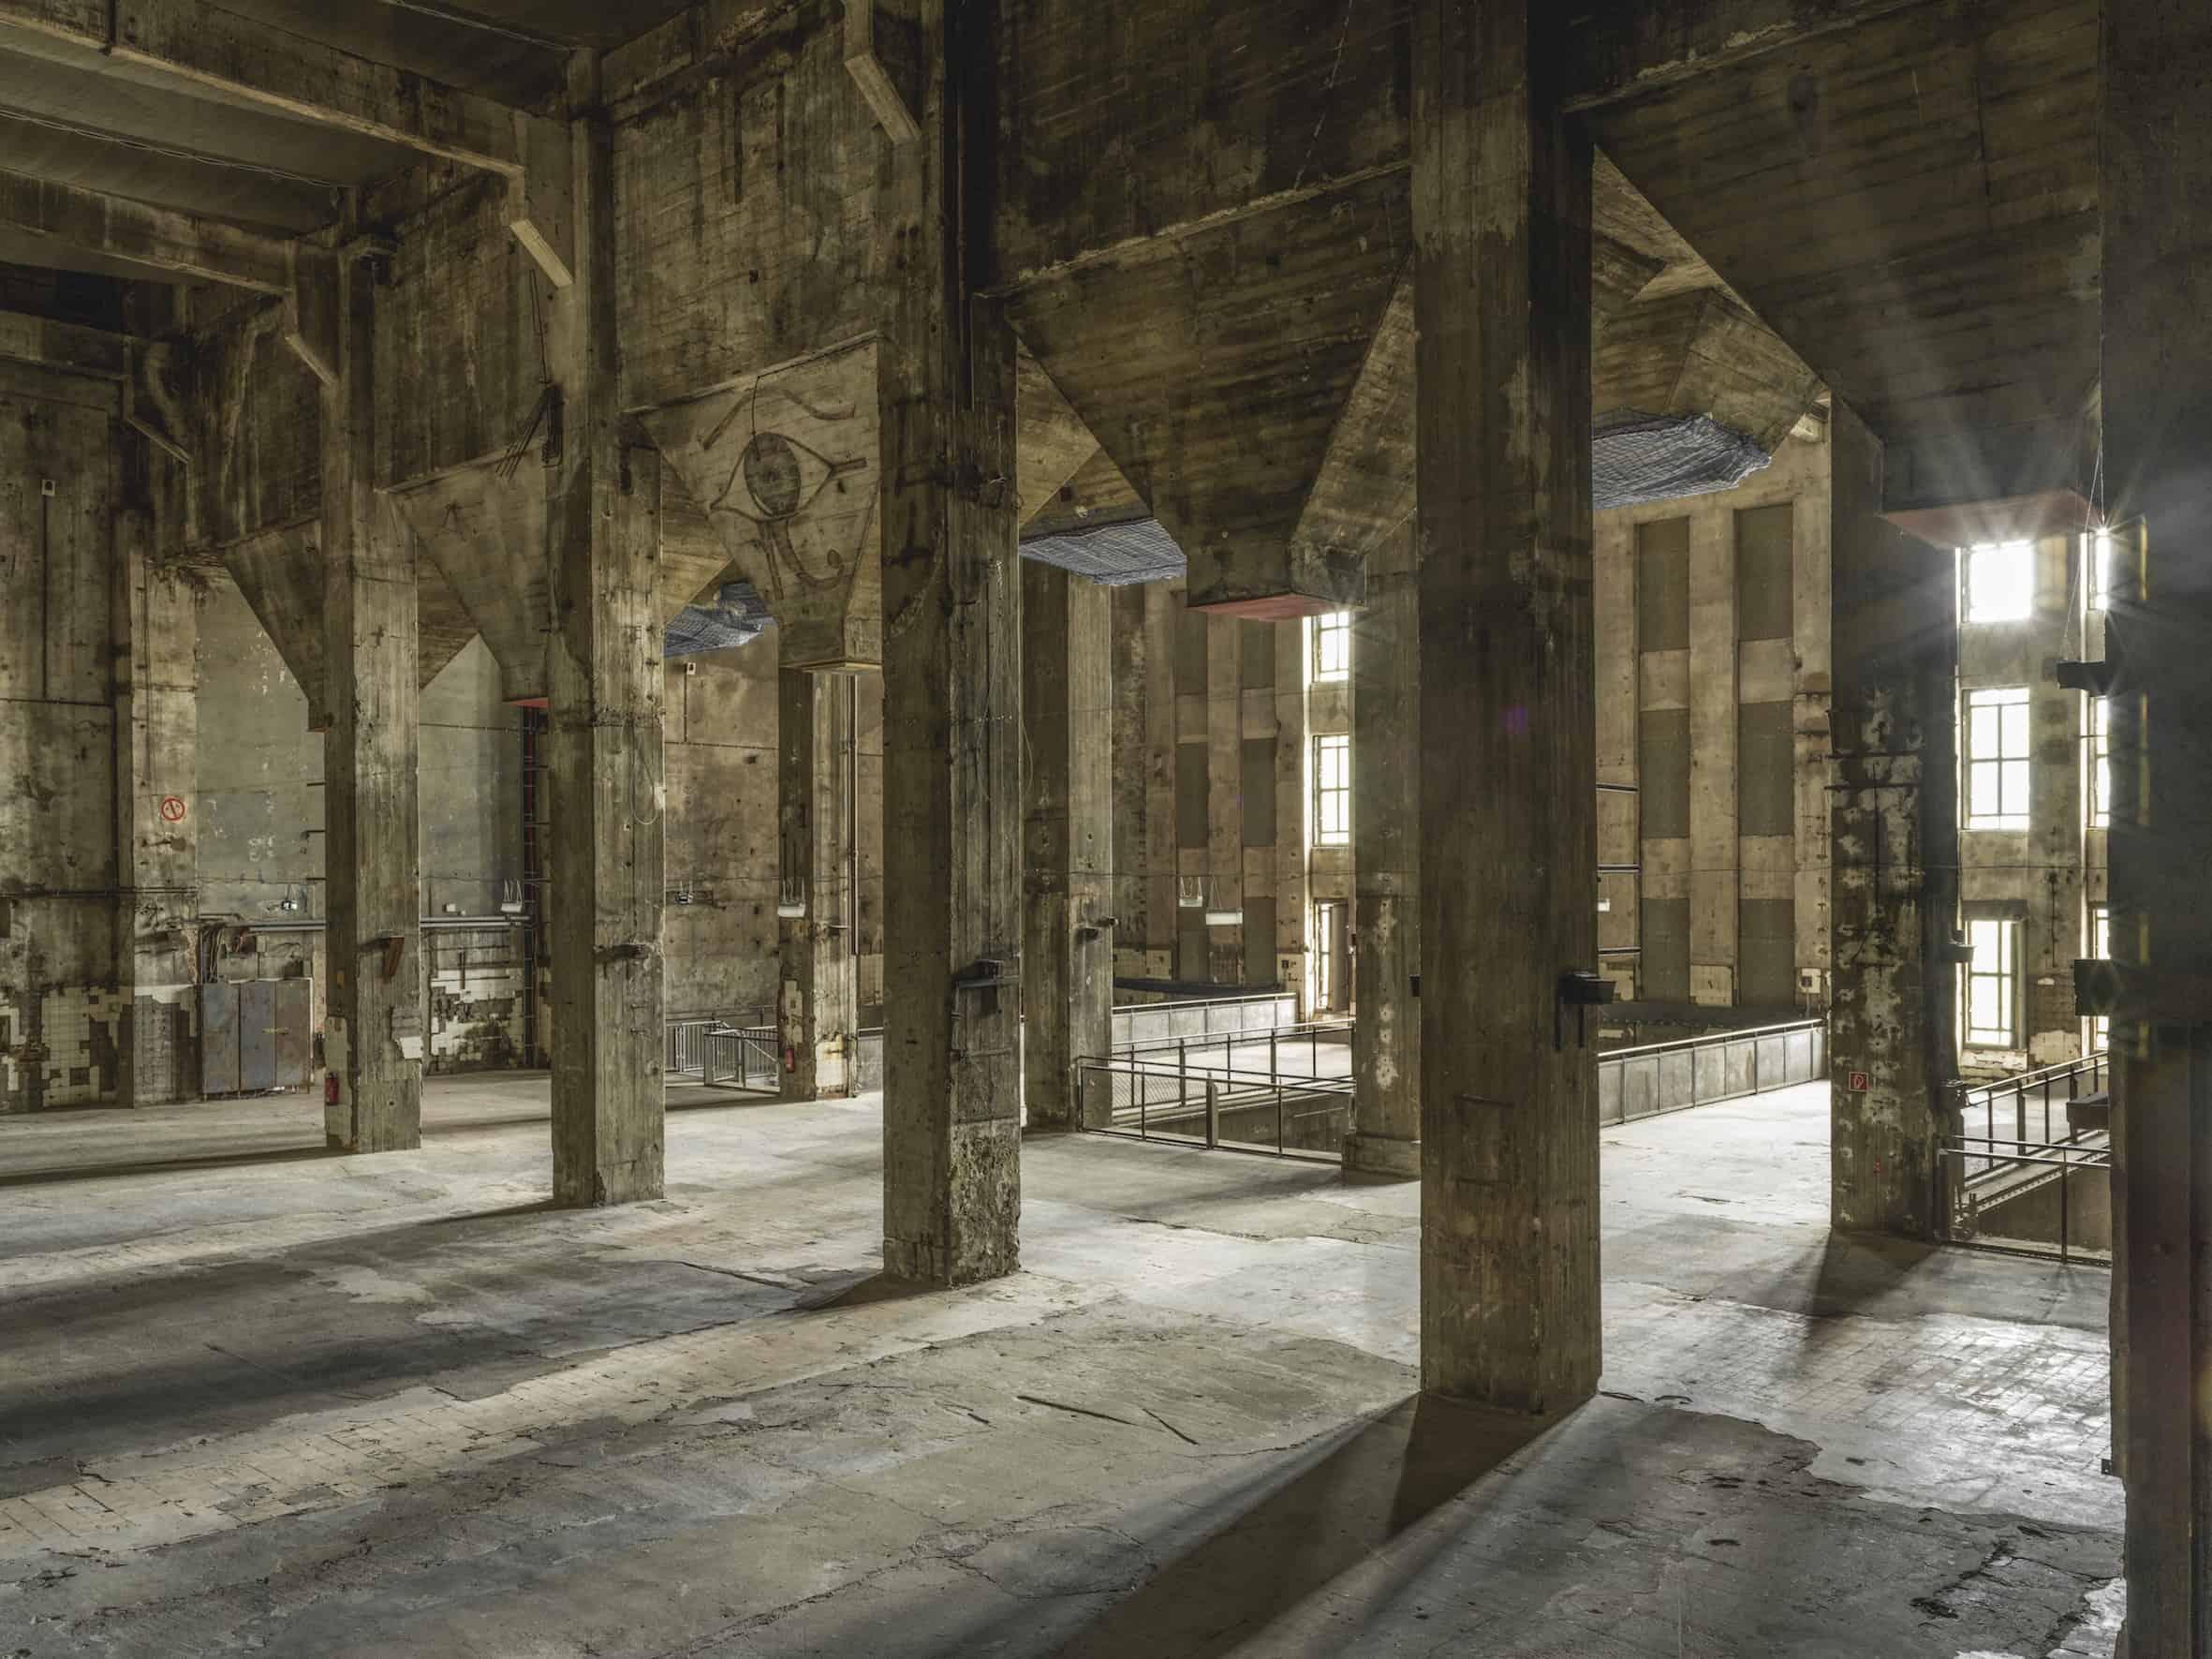 A photo inside Berghain taken by Roman März for sound art installation collective Singhur.